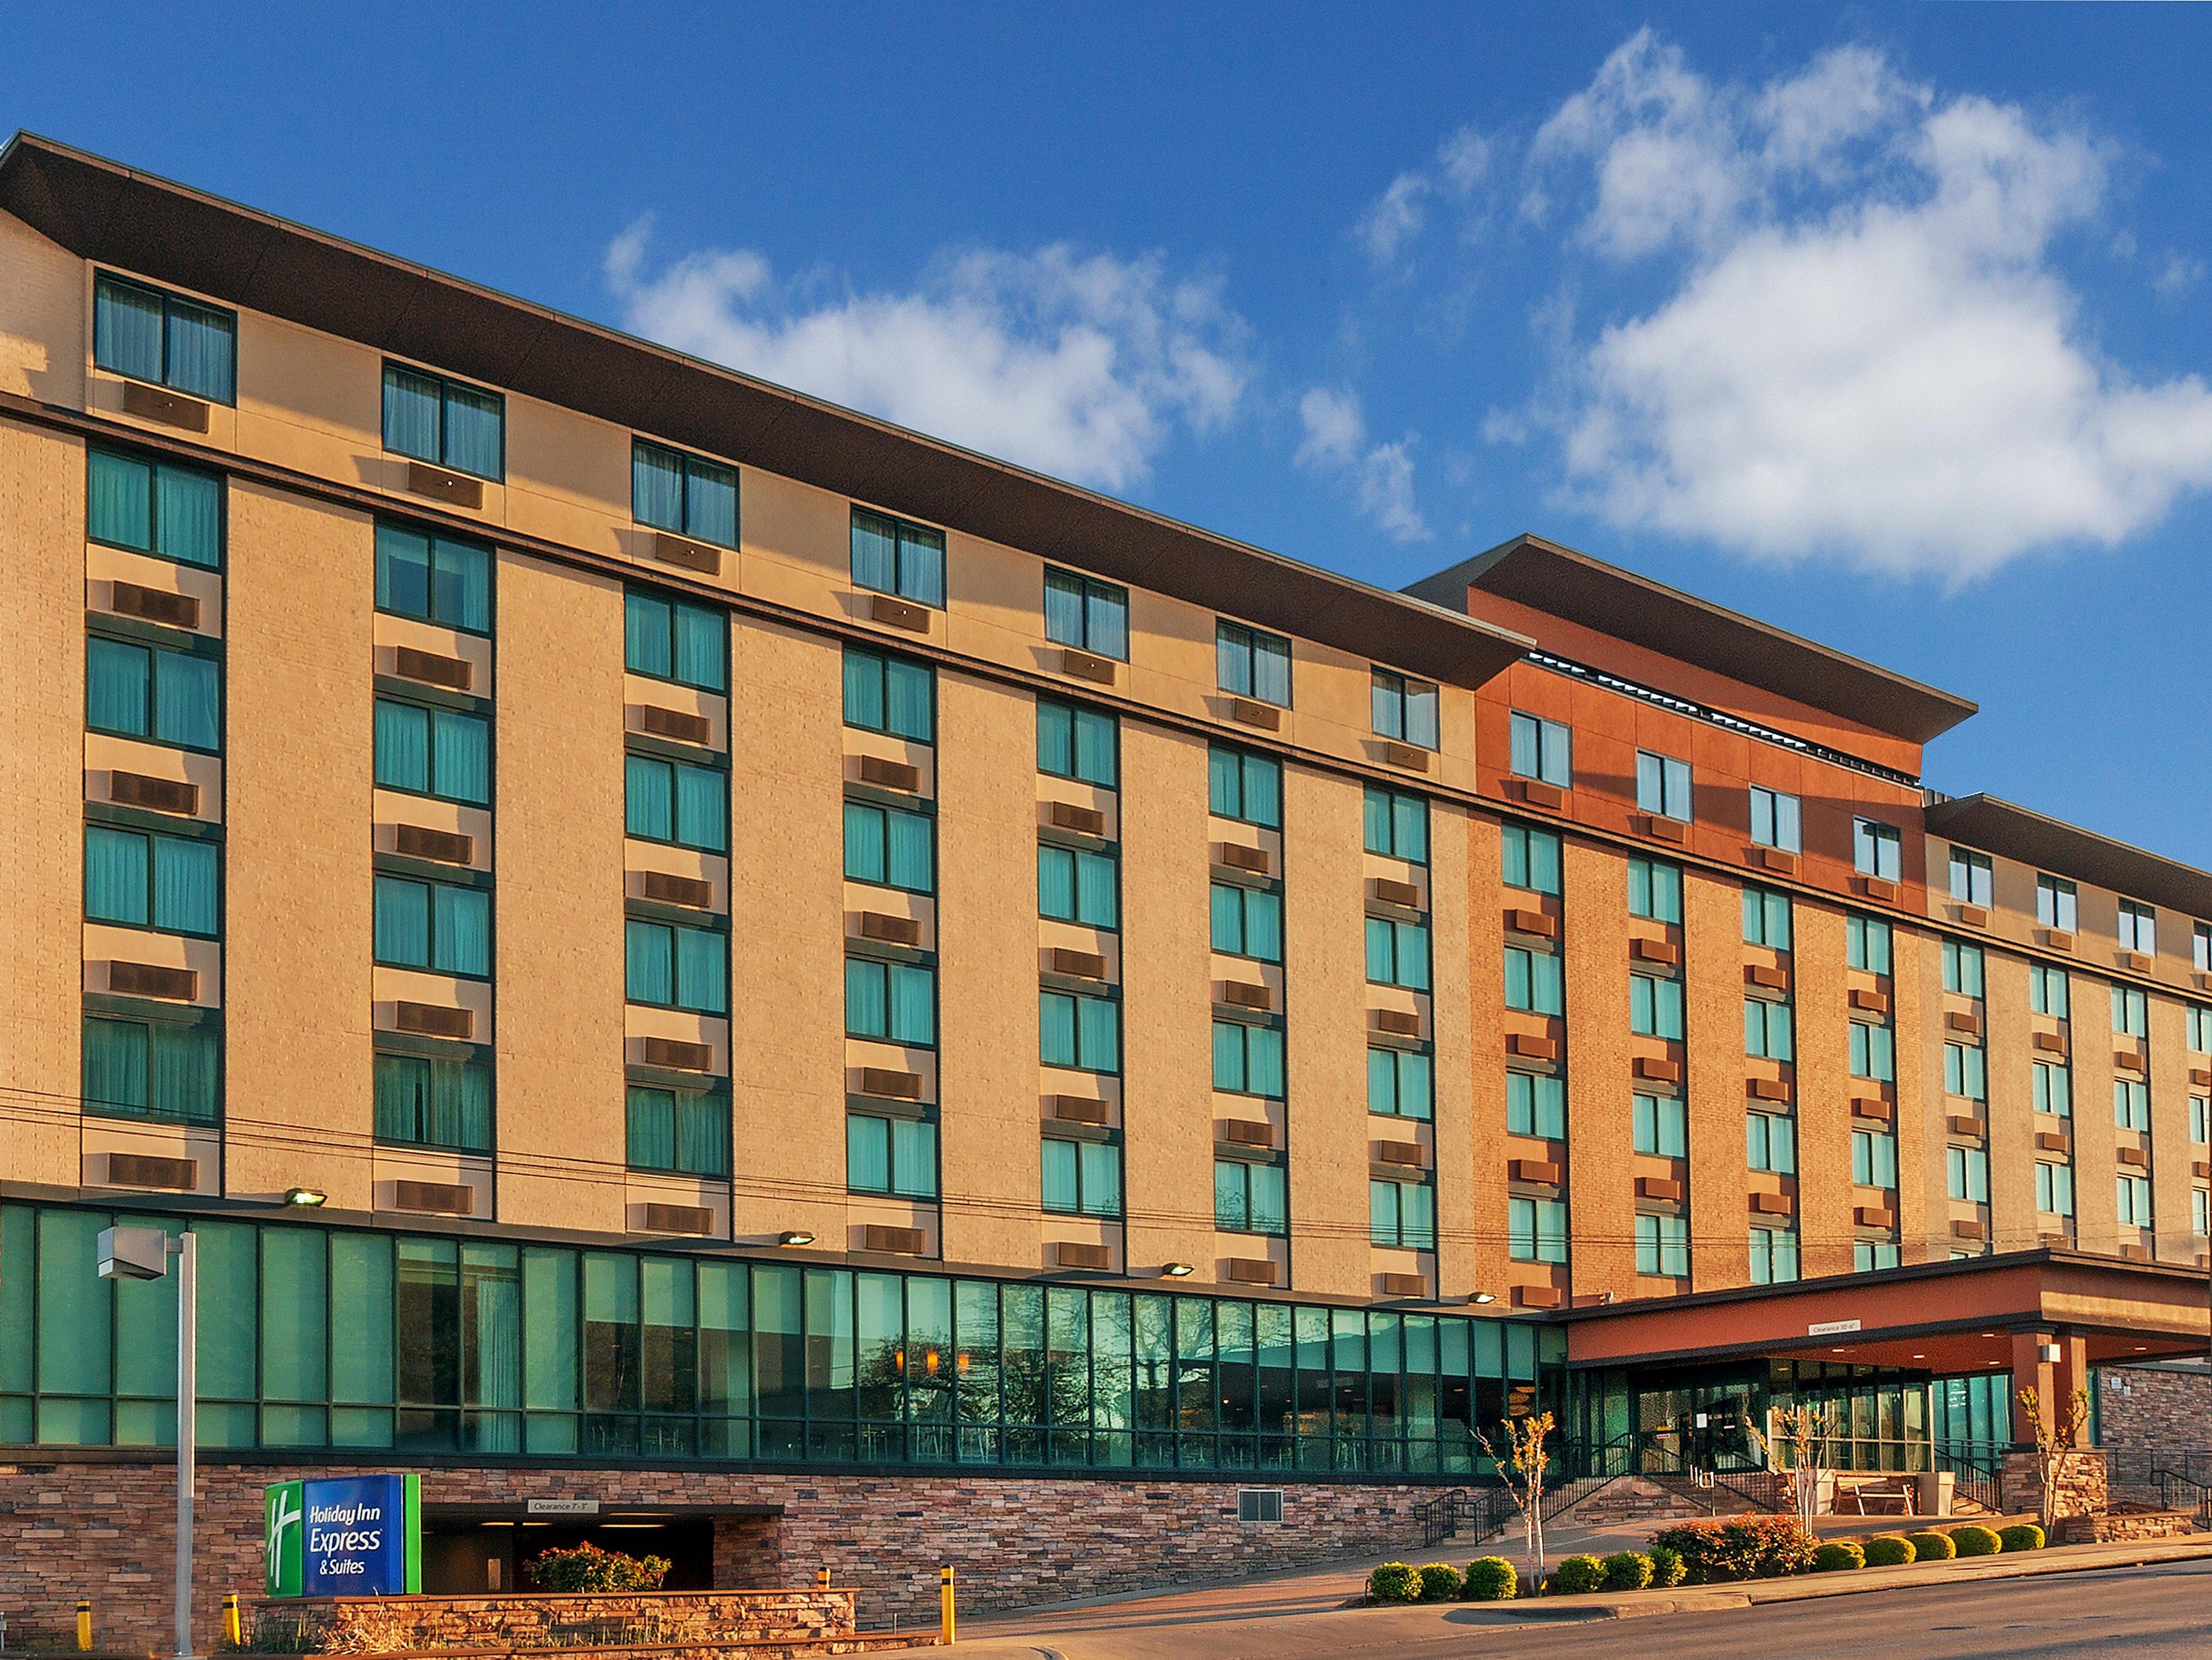 2289dfa849 Holiday Inn Express Fort Worth Downtown Hotel near TCU